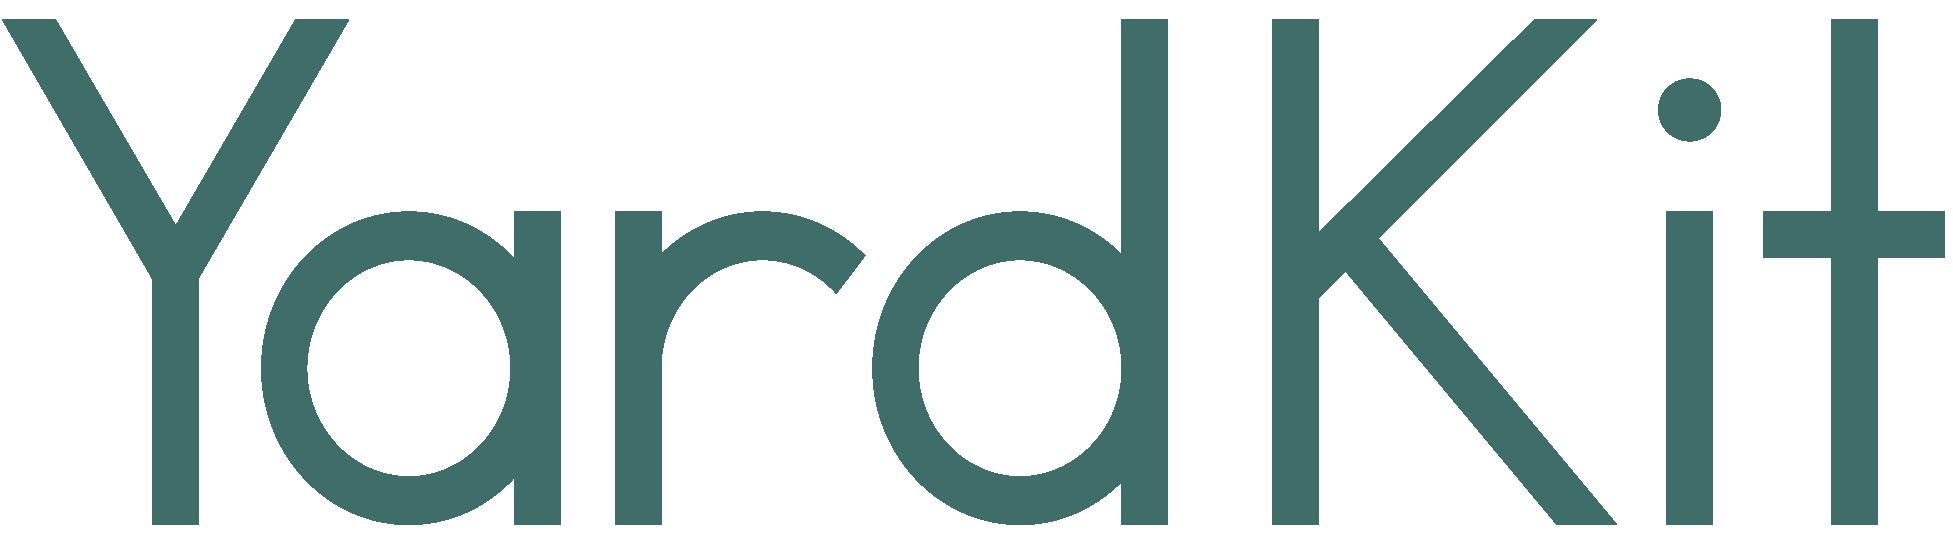 170707_Logo-type-emerald.png